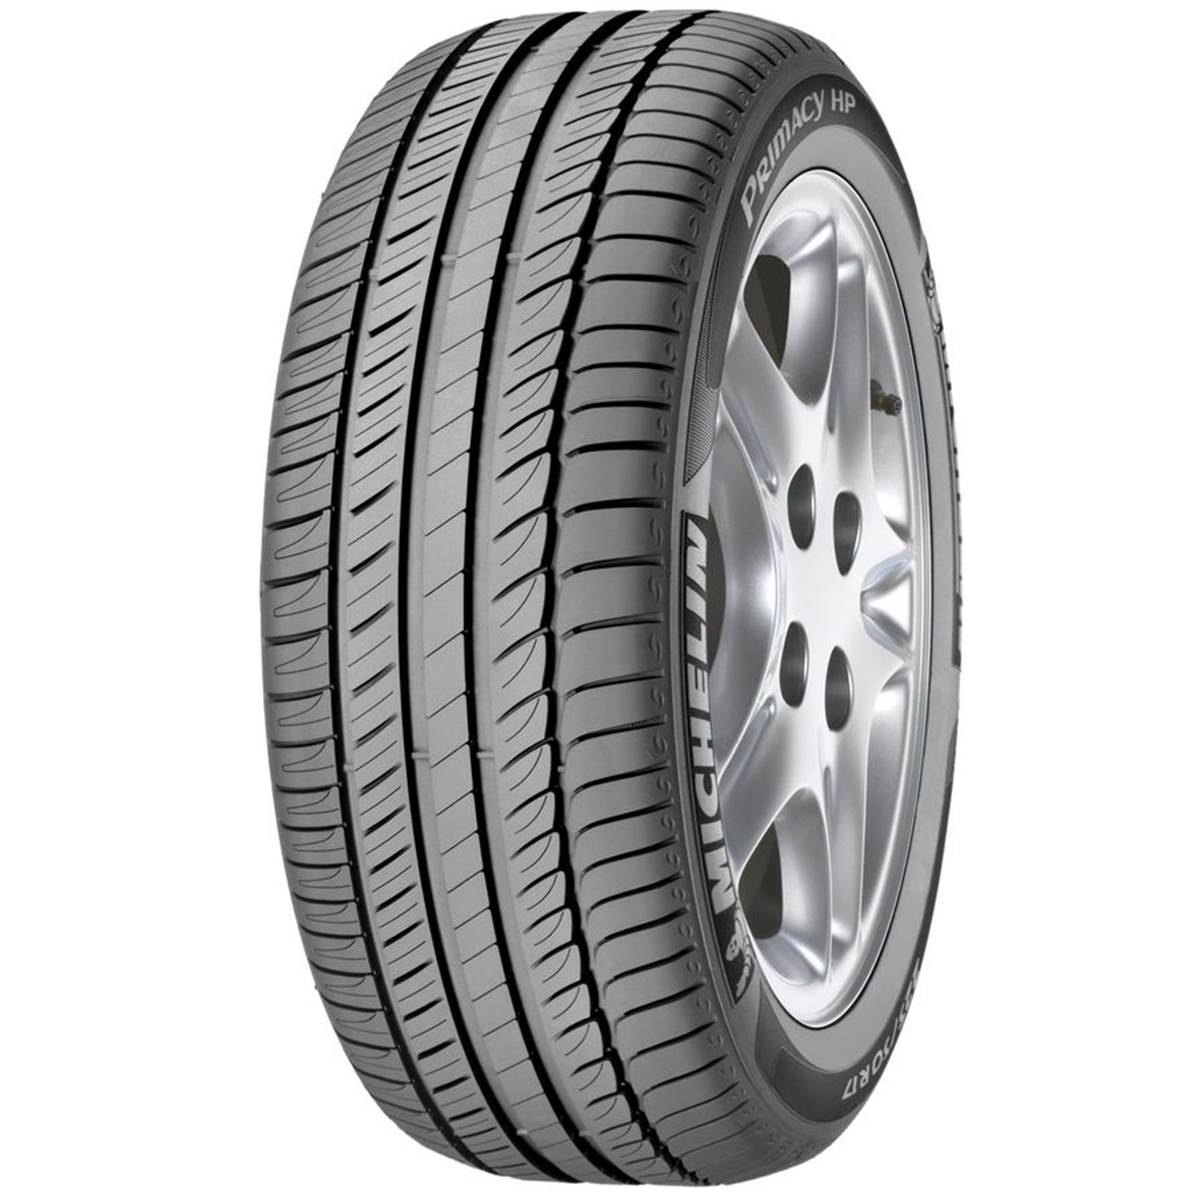 Pneu Michelin 205/55R16 91W PRIMACY HP